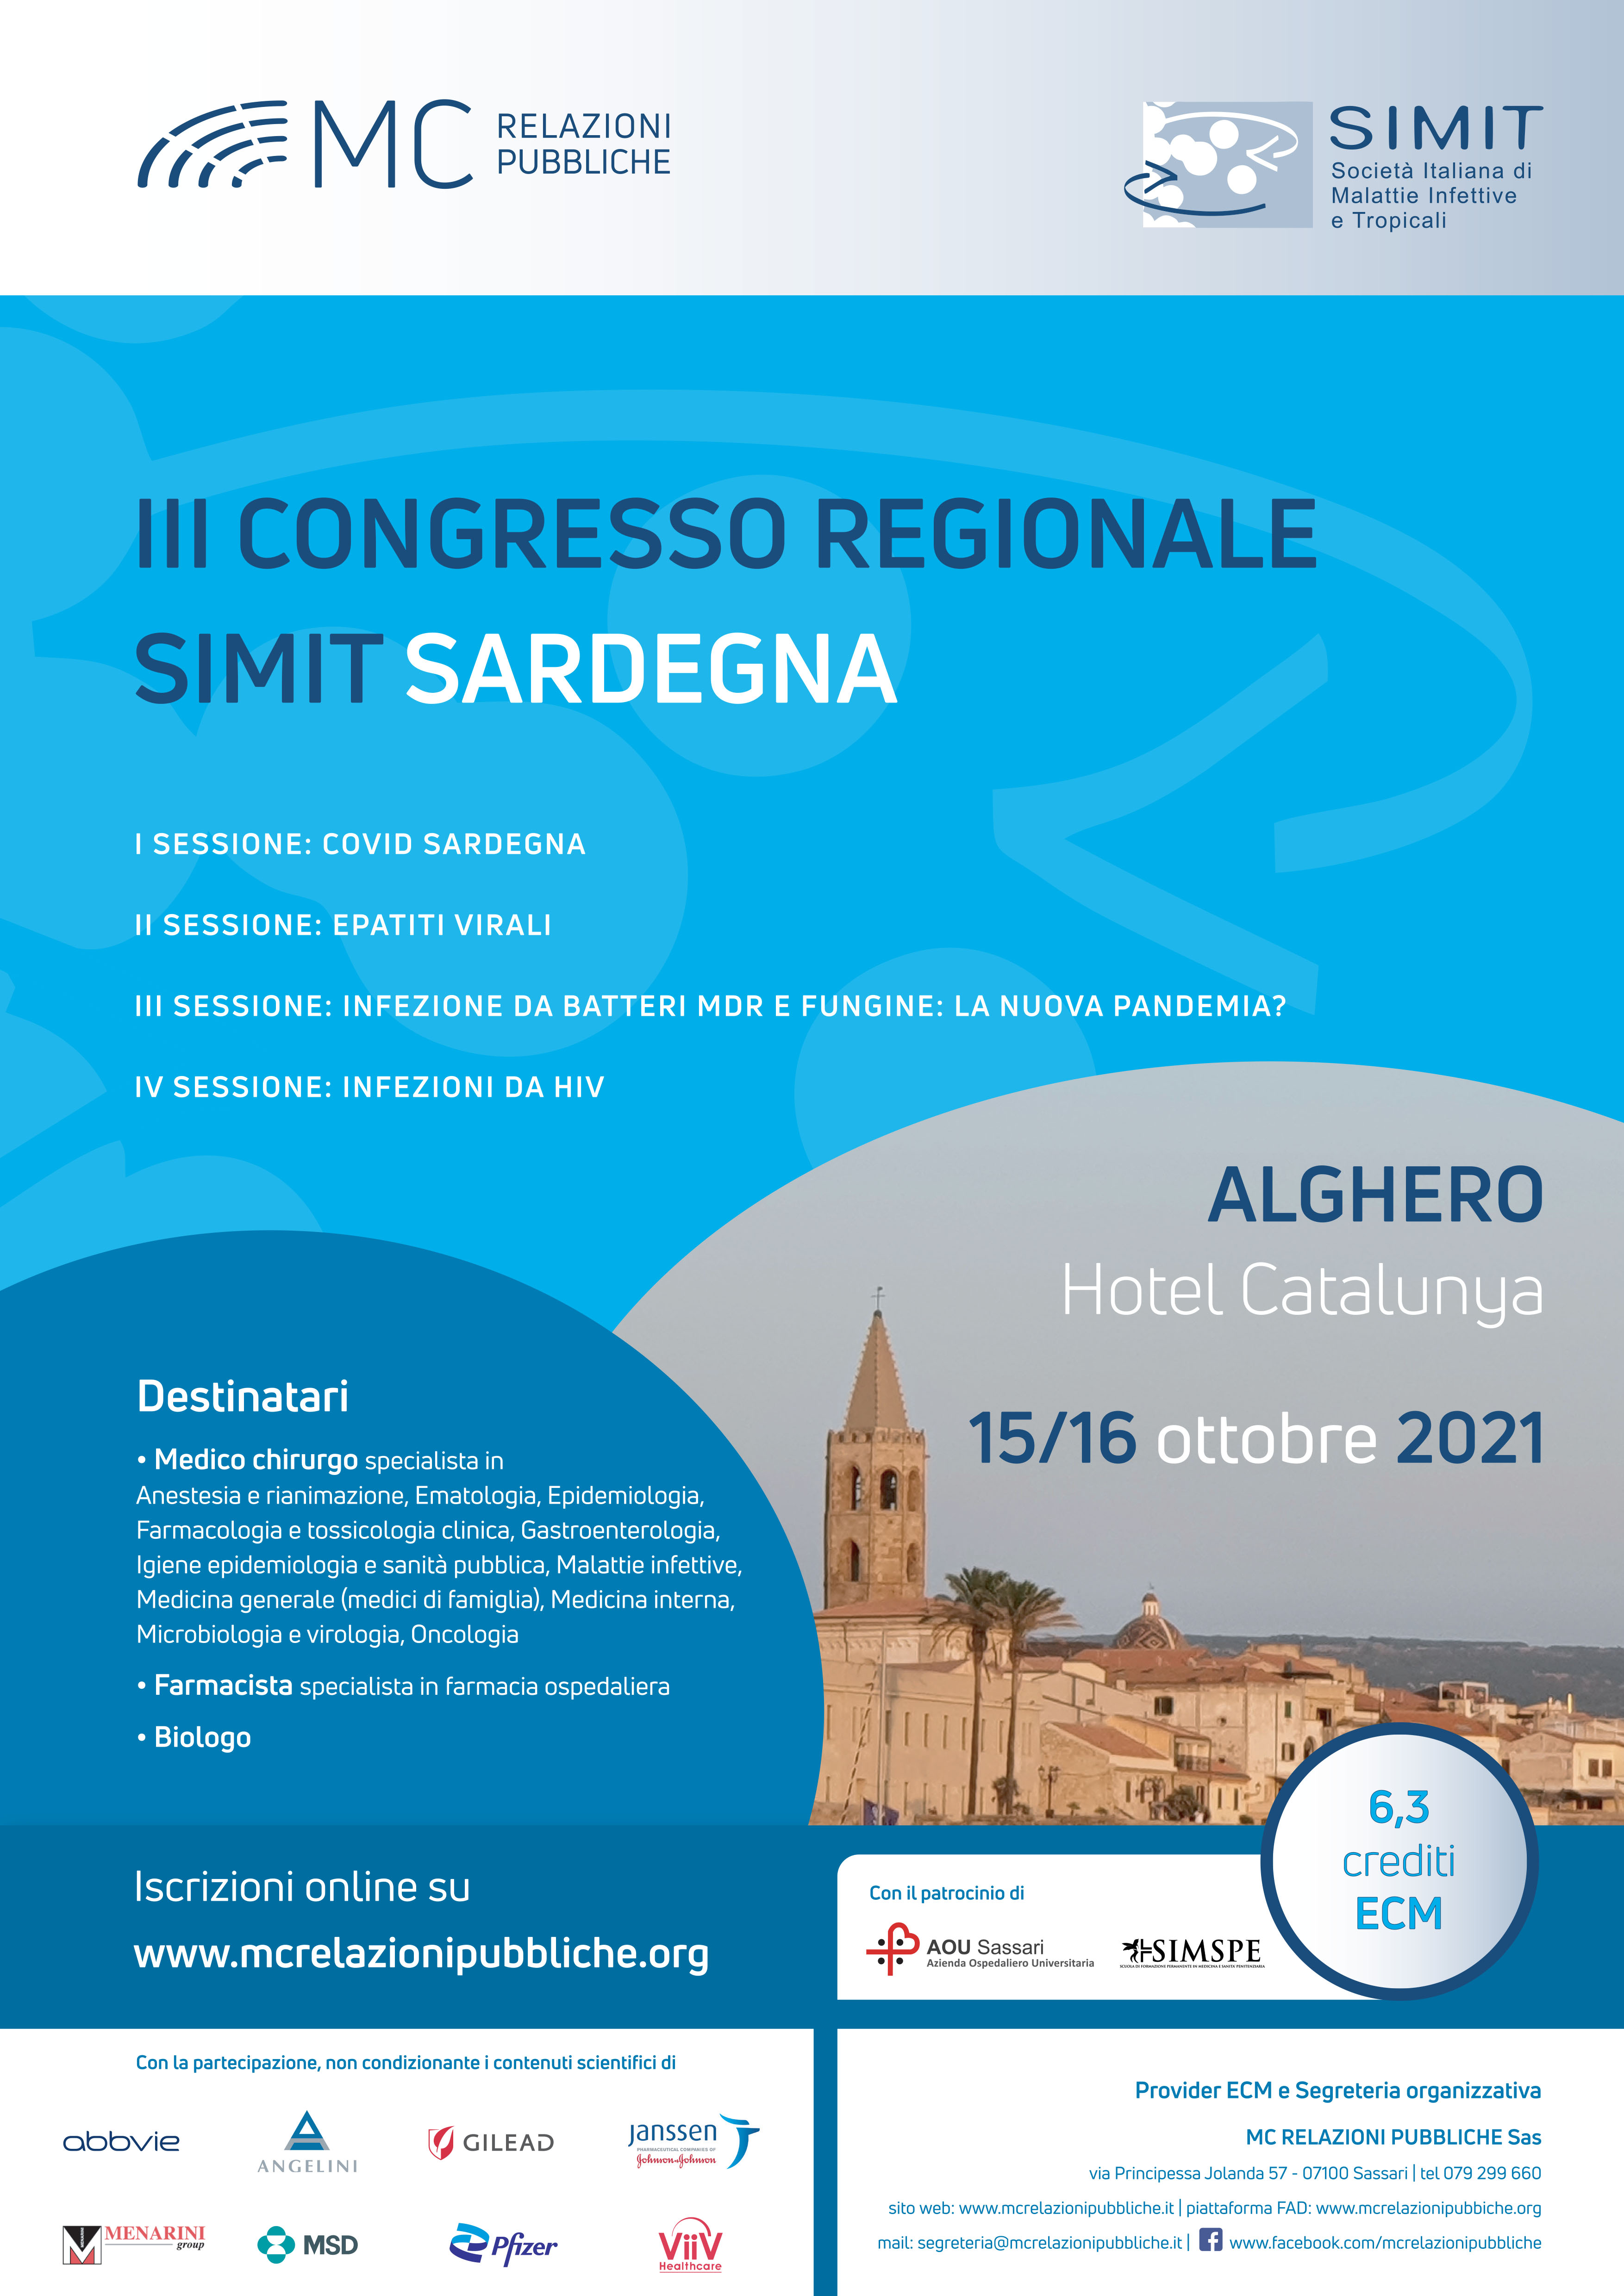 III Congresso Regionale SIMIT Sardegna